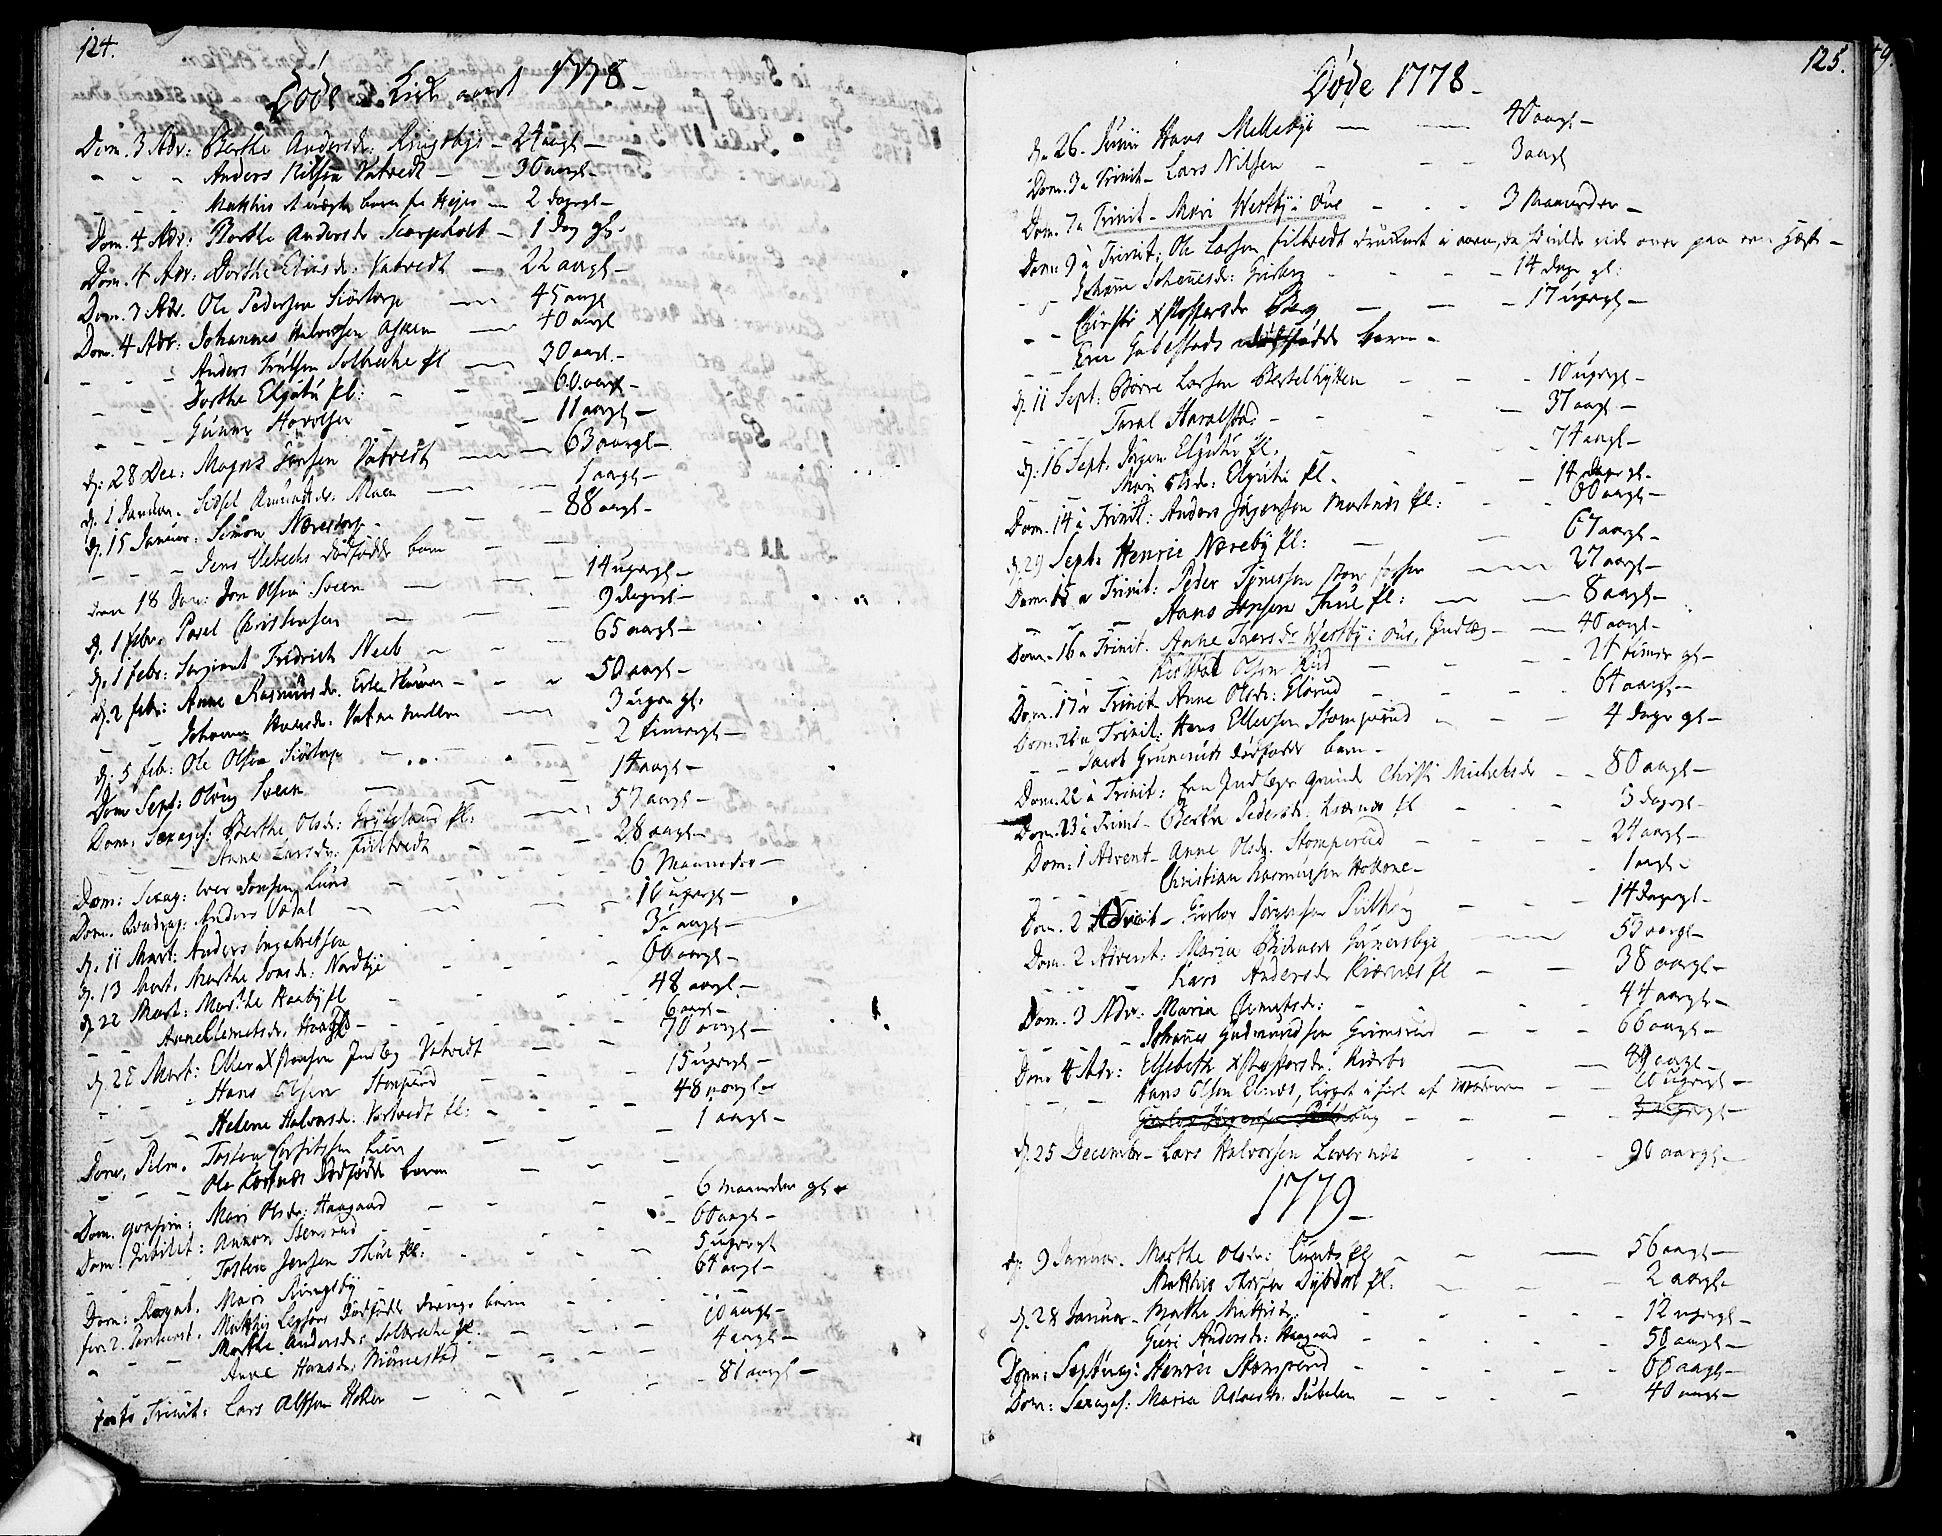 SAO, Rakkestad prestekontor Kirkebøker, F/Fa/L0004: Ministerialbok nr. I 4, 1777-1783, s. 124-125